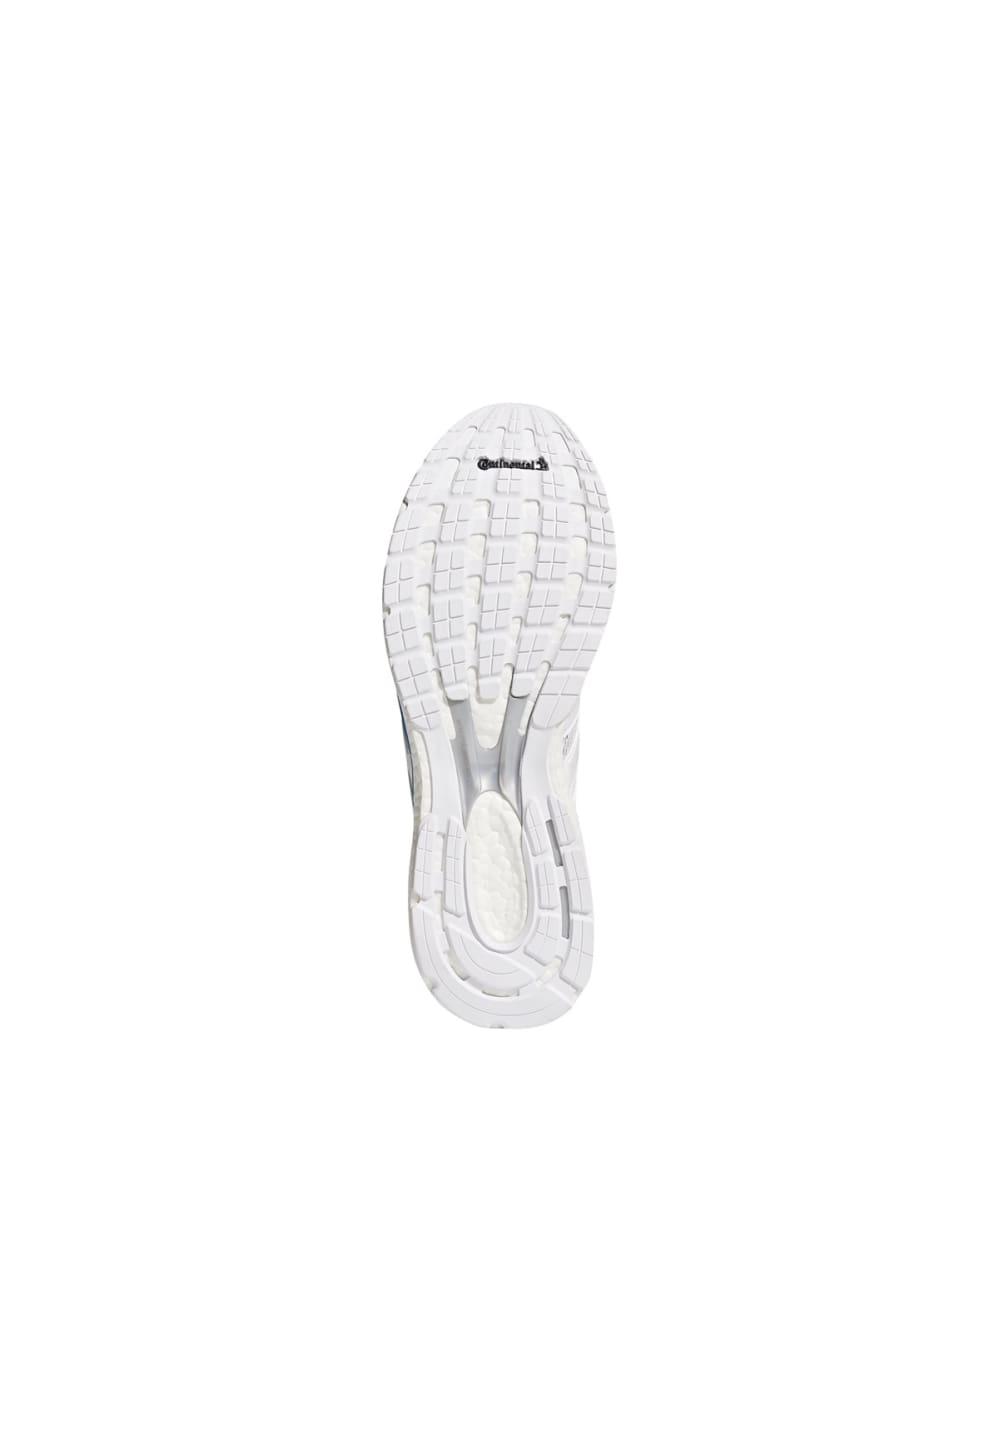 low priced 7b9f1 94775 ... adidas Adizero Boston 6 Aktiv - Zapatillas de running - Blanco. Volver.  1 2. Previous